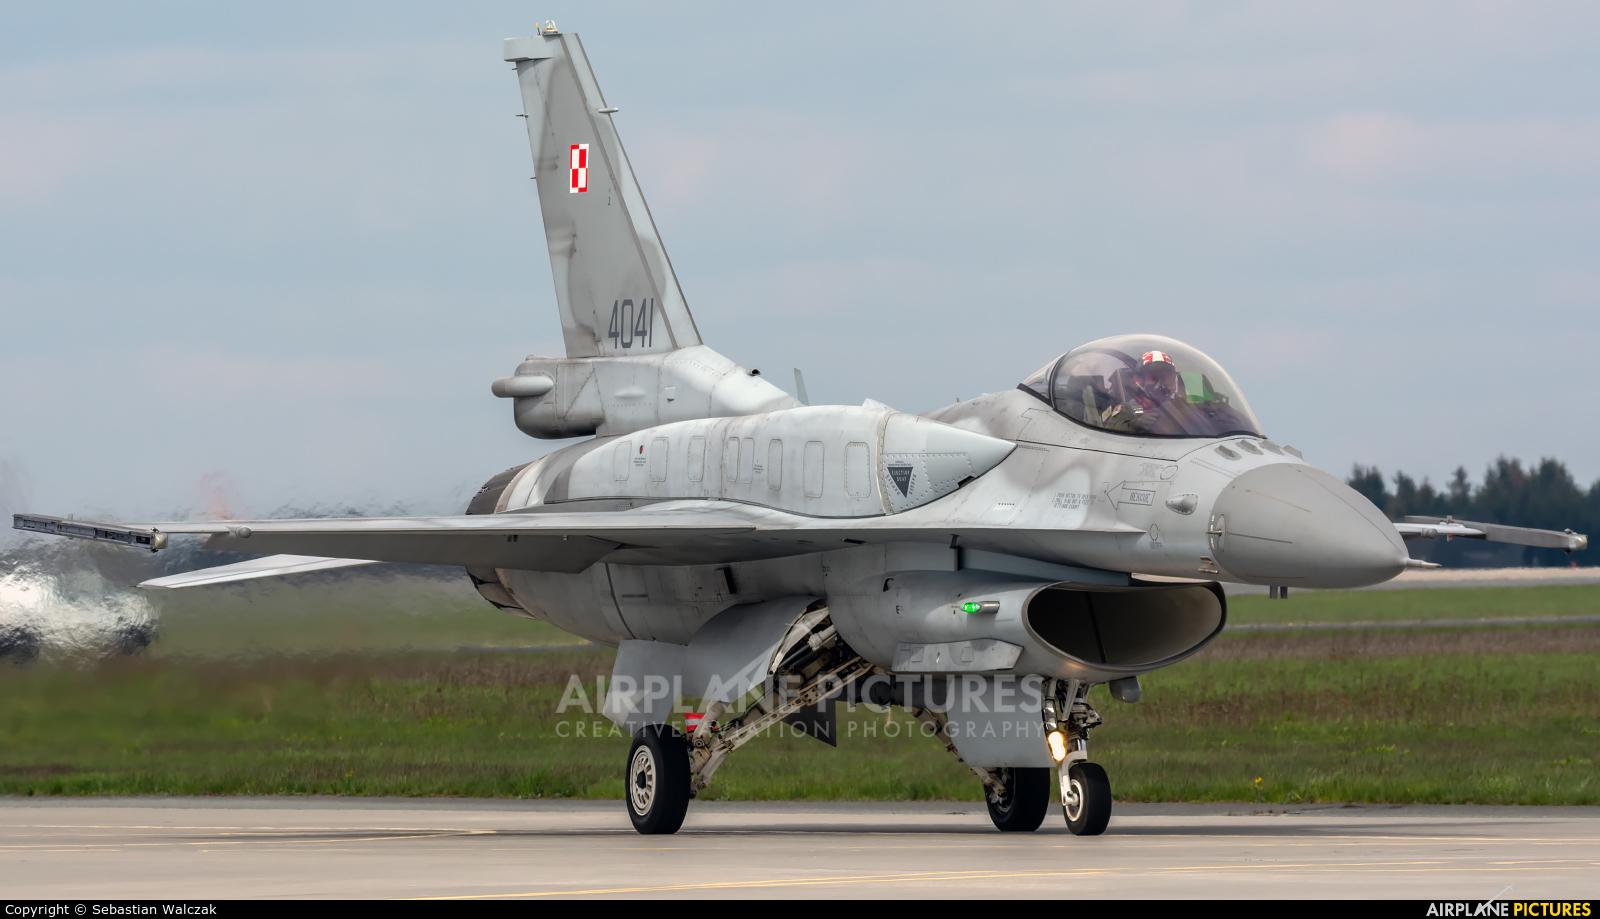 Poland - Air Force 4041 aircraft at Poznań - Krzesiny